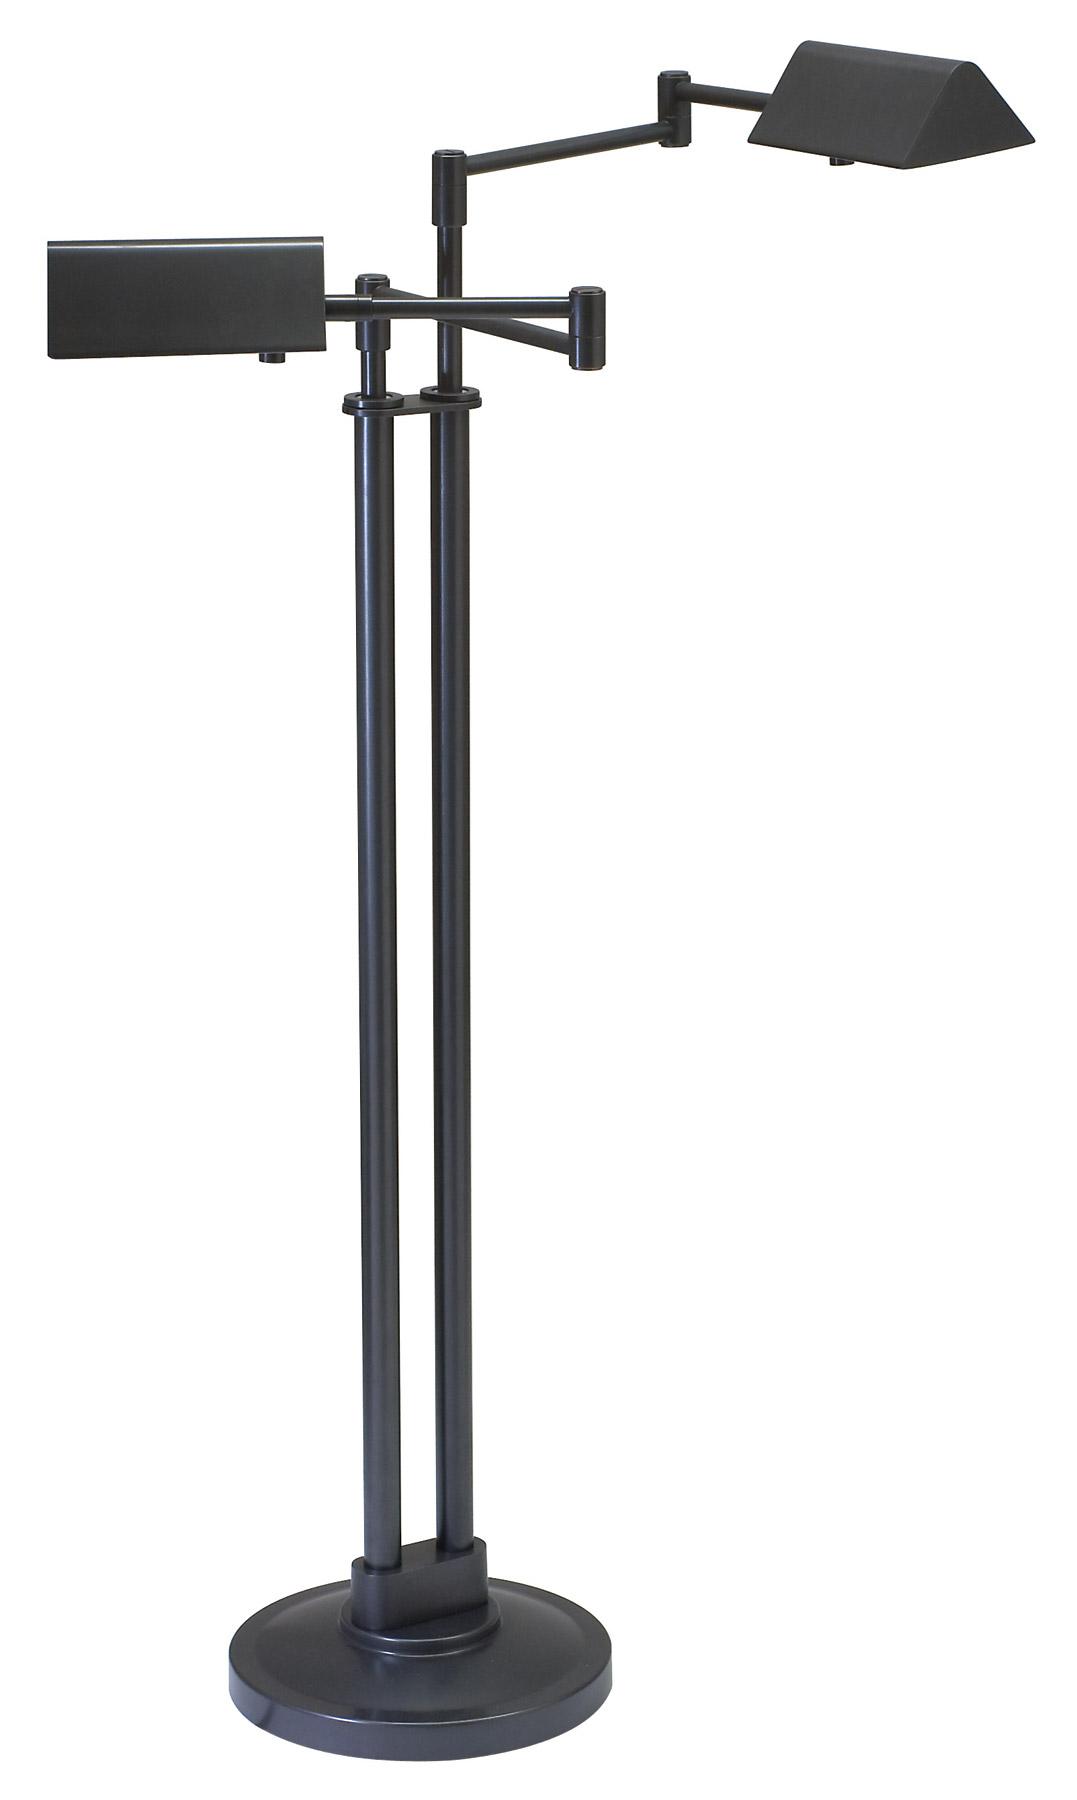 House Of Troy Pin400 2 Ob Pinnacle Double Swing Arm Floor Lamp